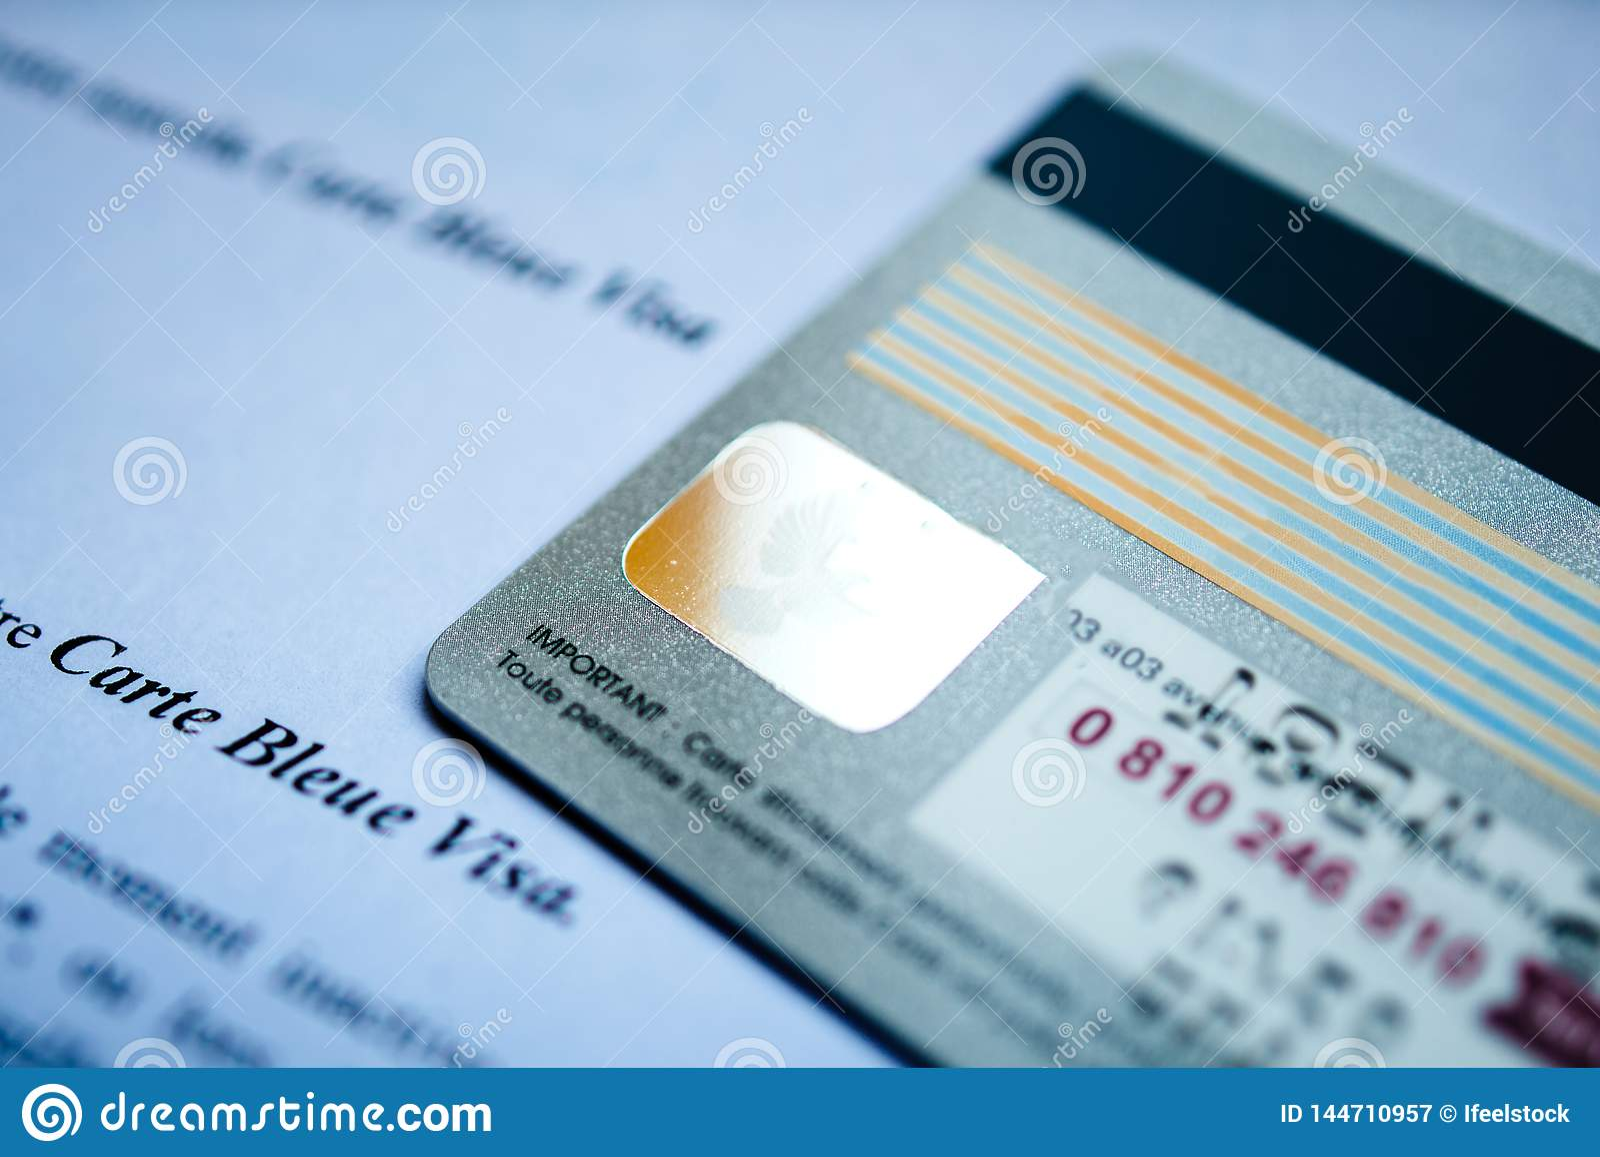 New HSBC Visa Debit Card With Visa Hologram Back Editorial